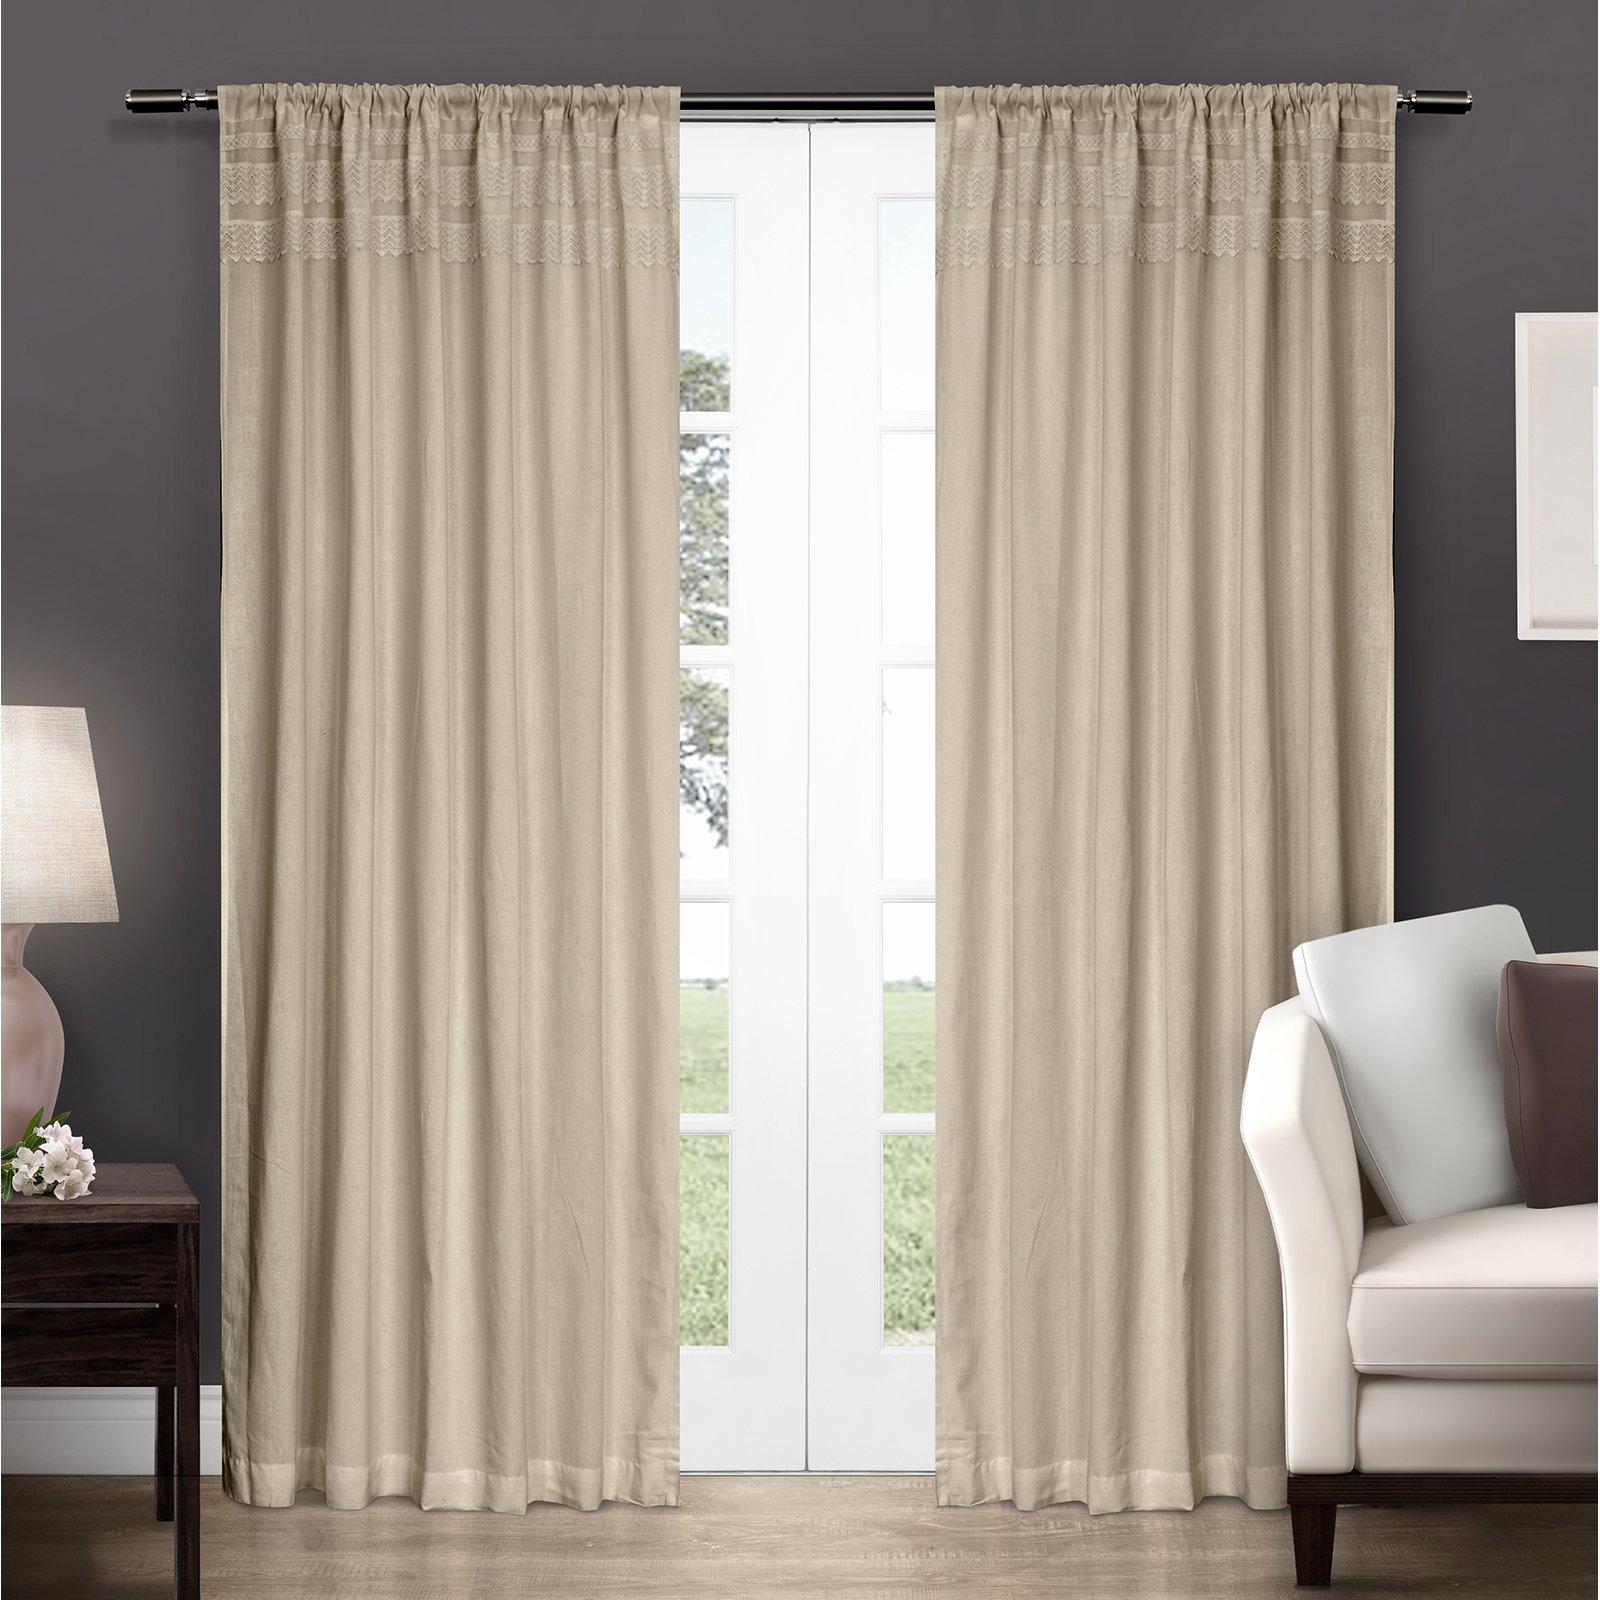 Exclusive Home Vintage Crochet Cotton Window Curtain Panel Pair With Rod Pocket Walmart Com Walmart Com